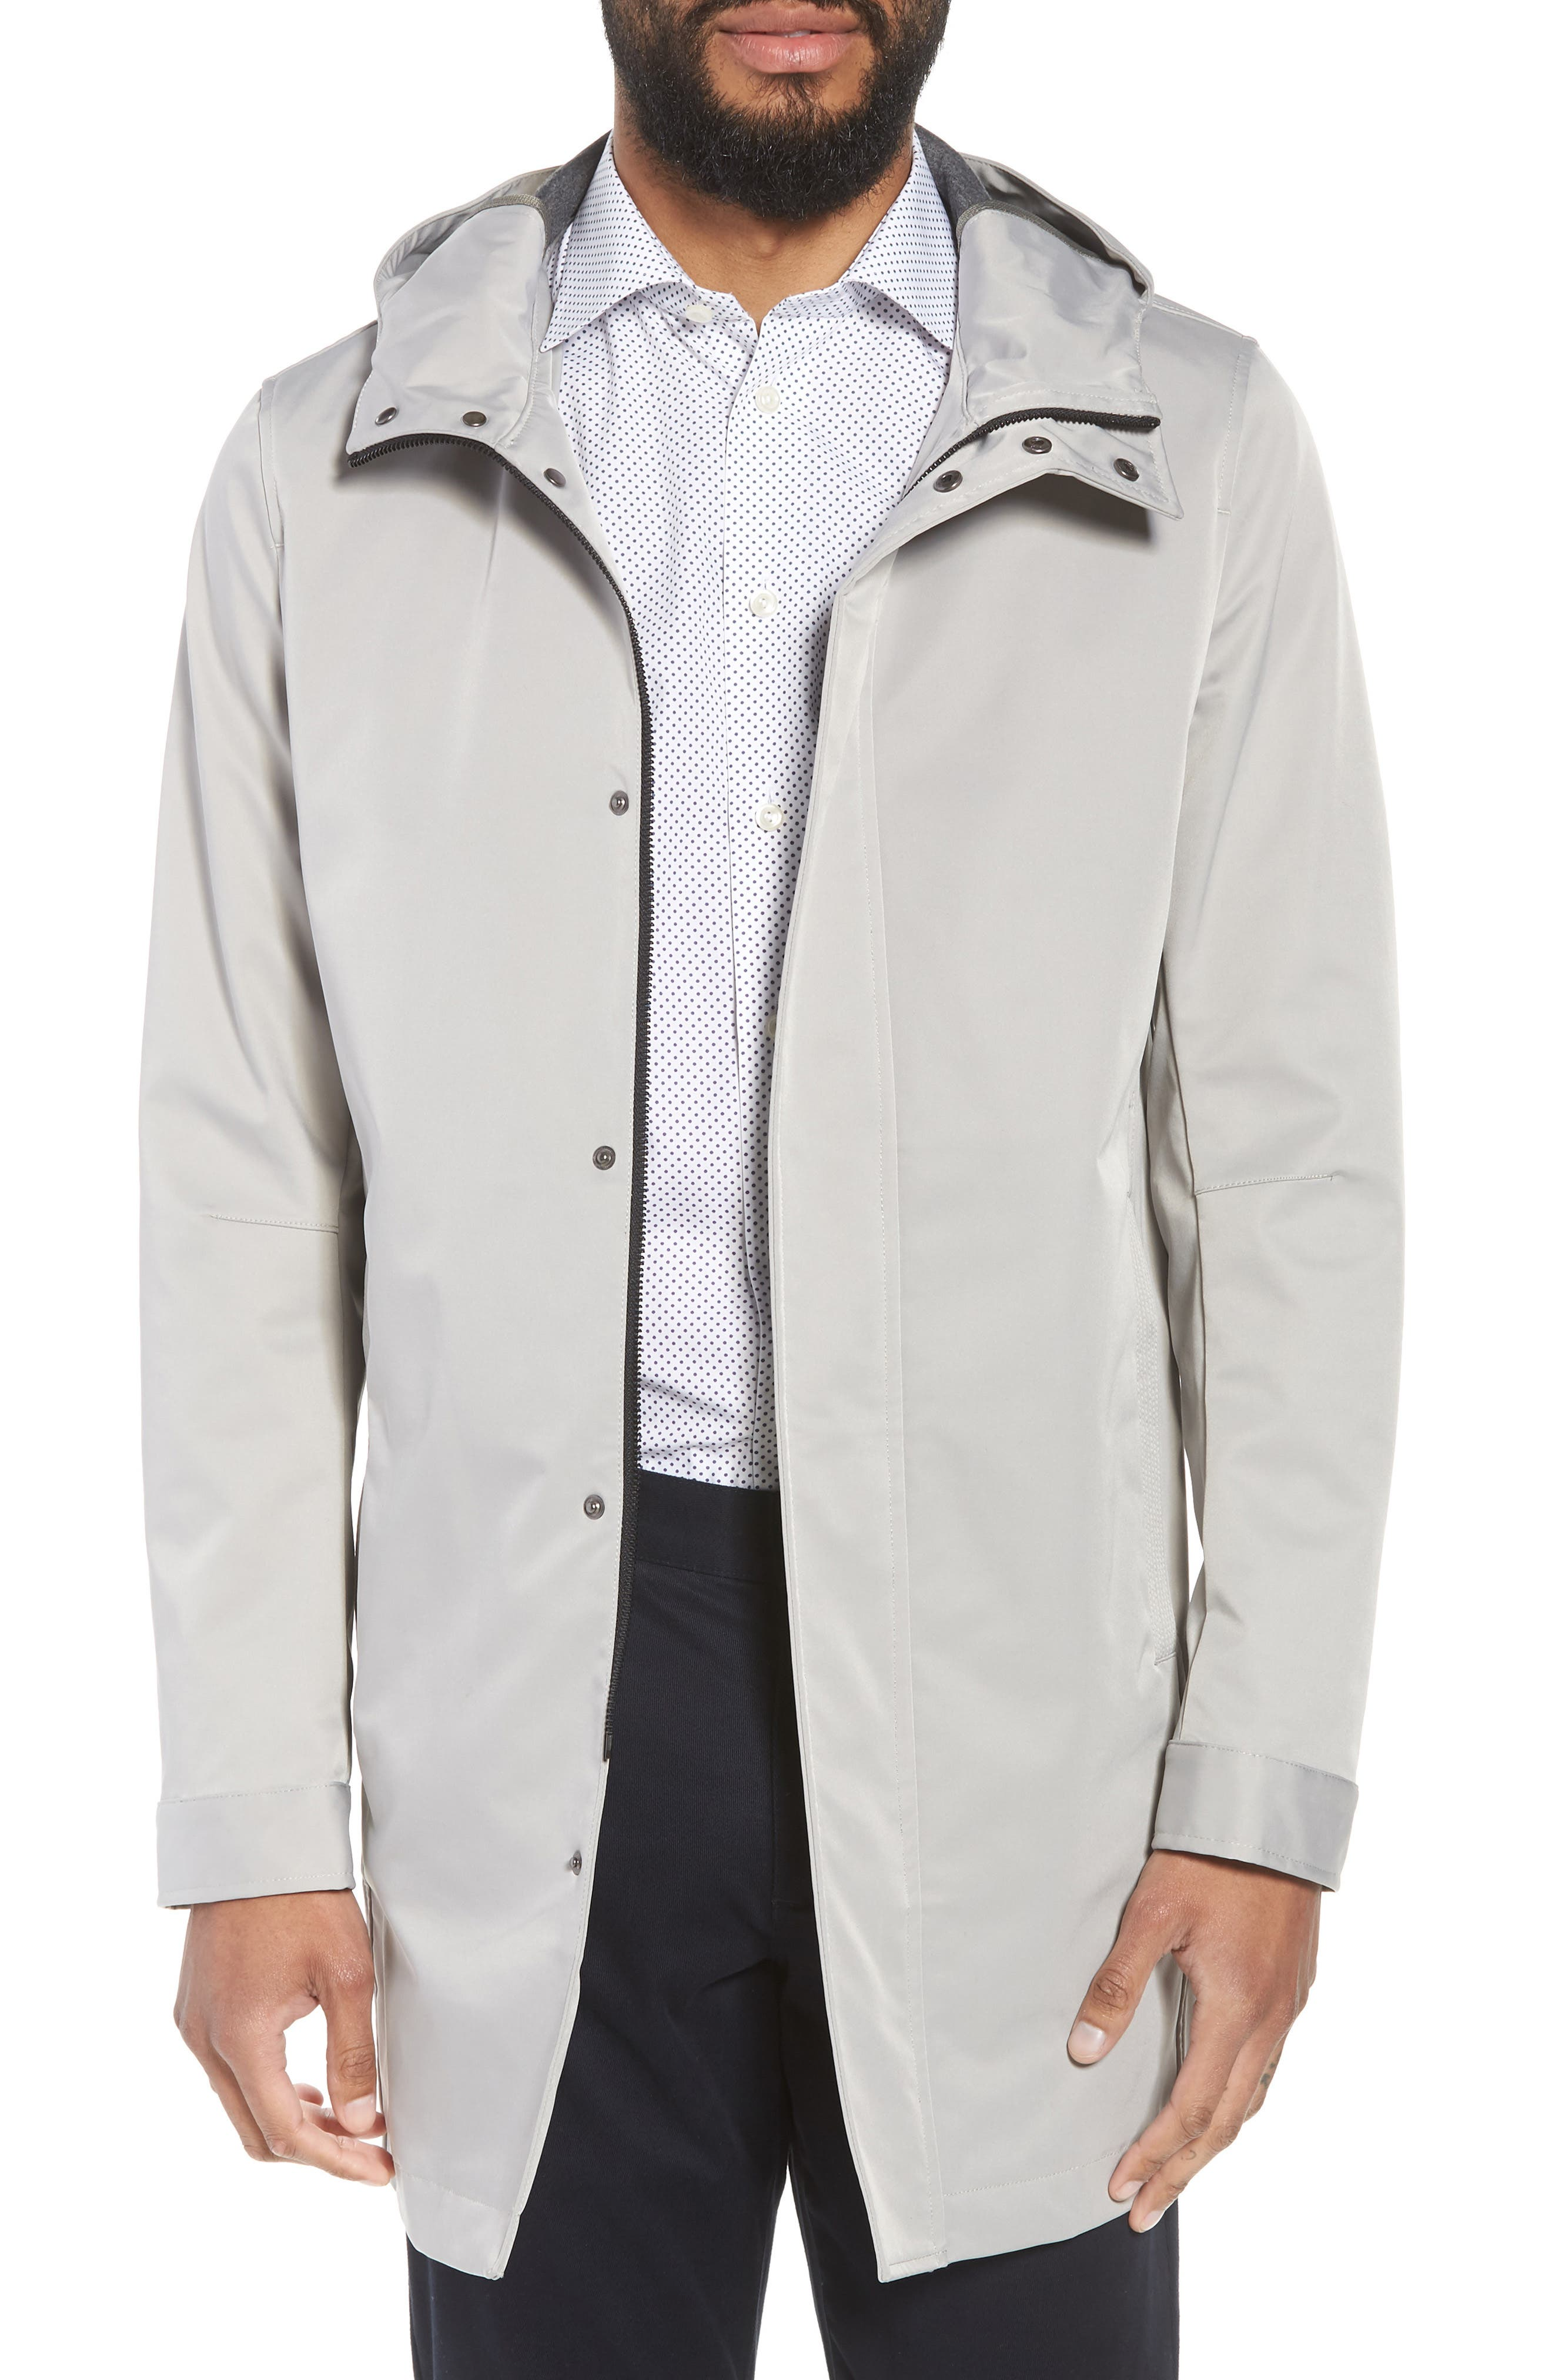 Verner Hooded Mac Jacket,                             Main thumbnail 1, color,                             Taupe